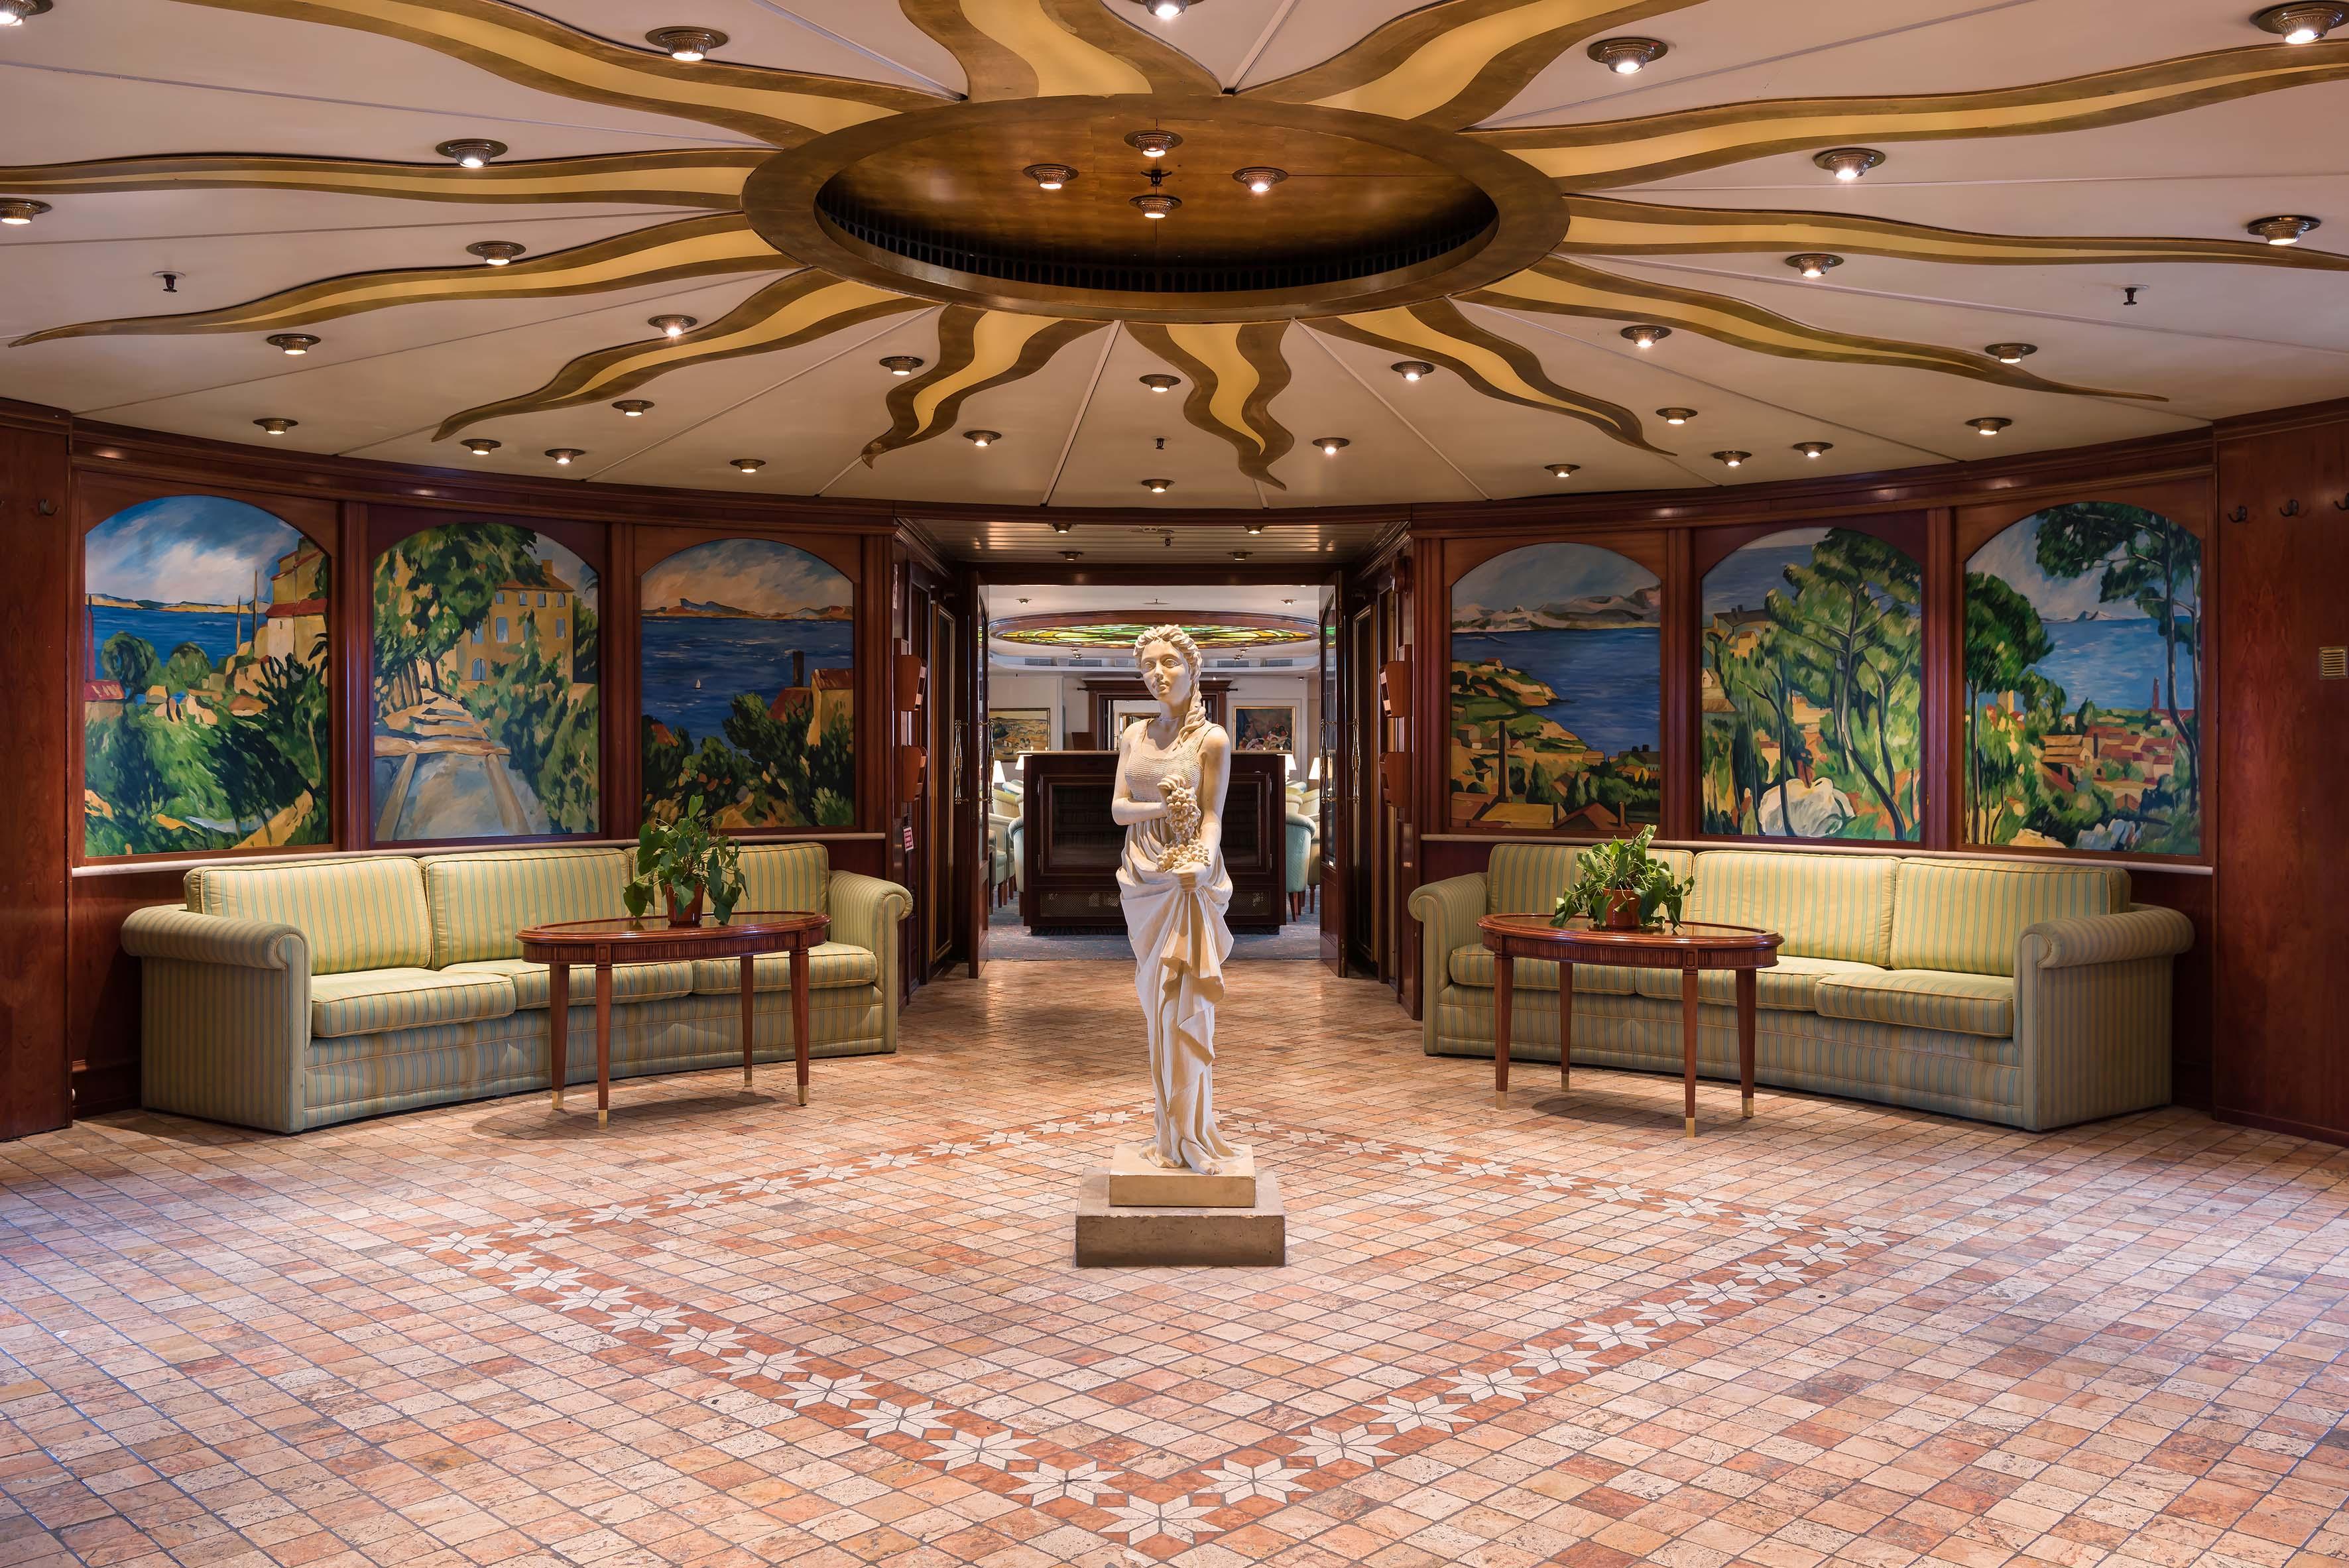 The hall of Hotelschiff MS Cezanne, Düsseldorf